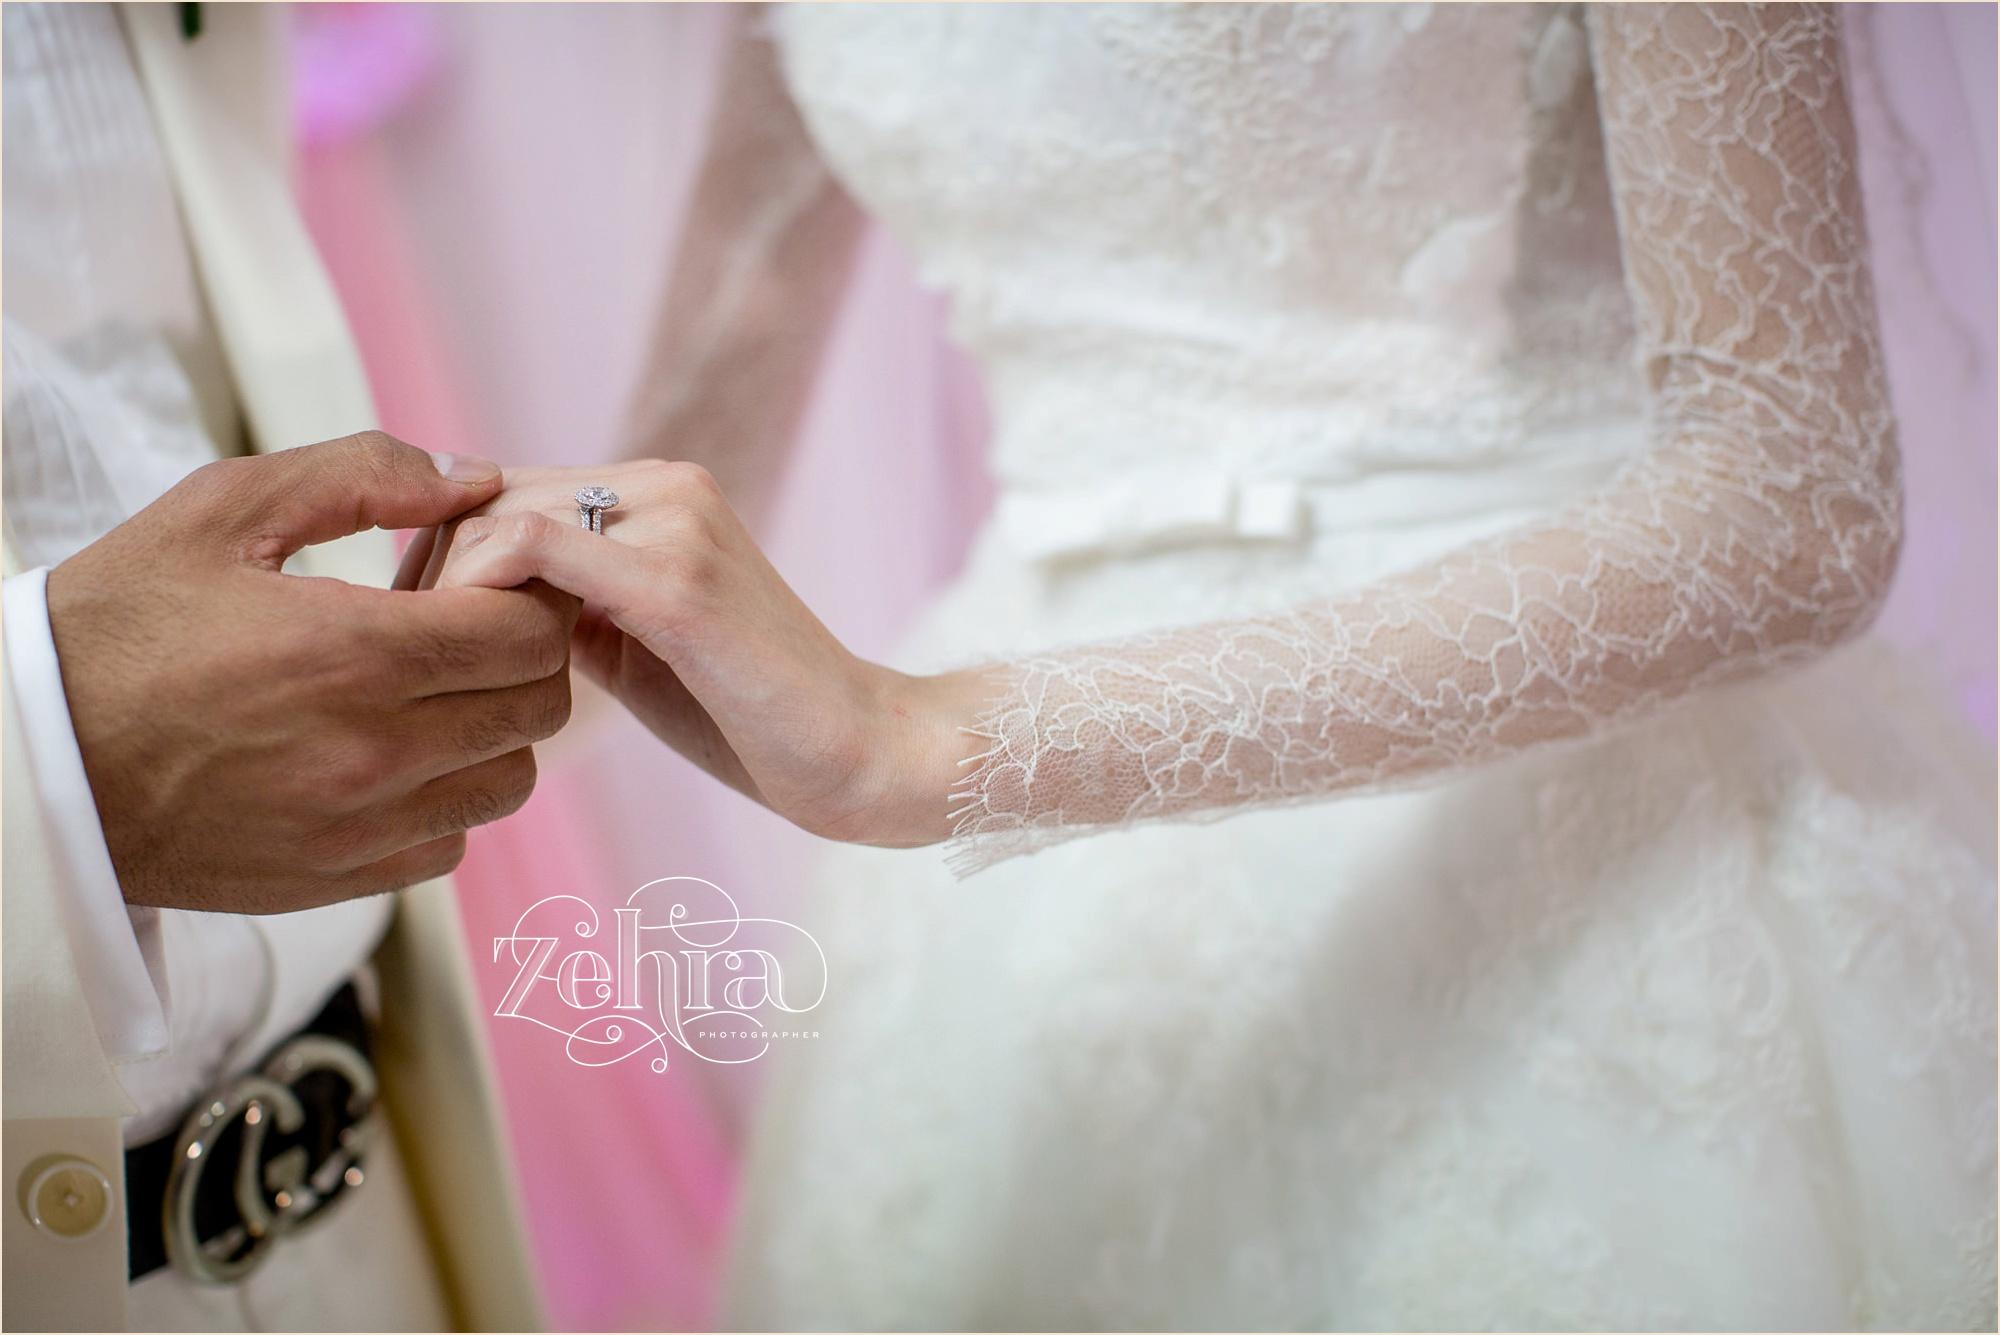 jasira manchester wedding photographer_0041.jpg